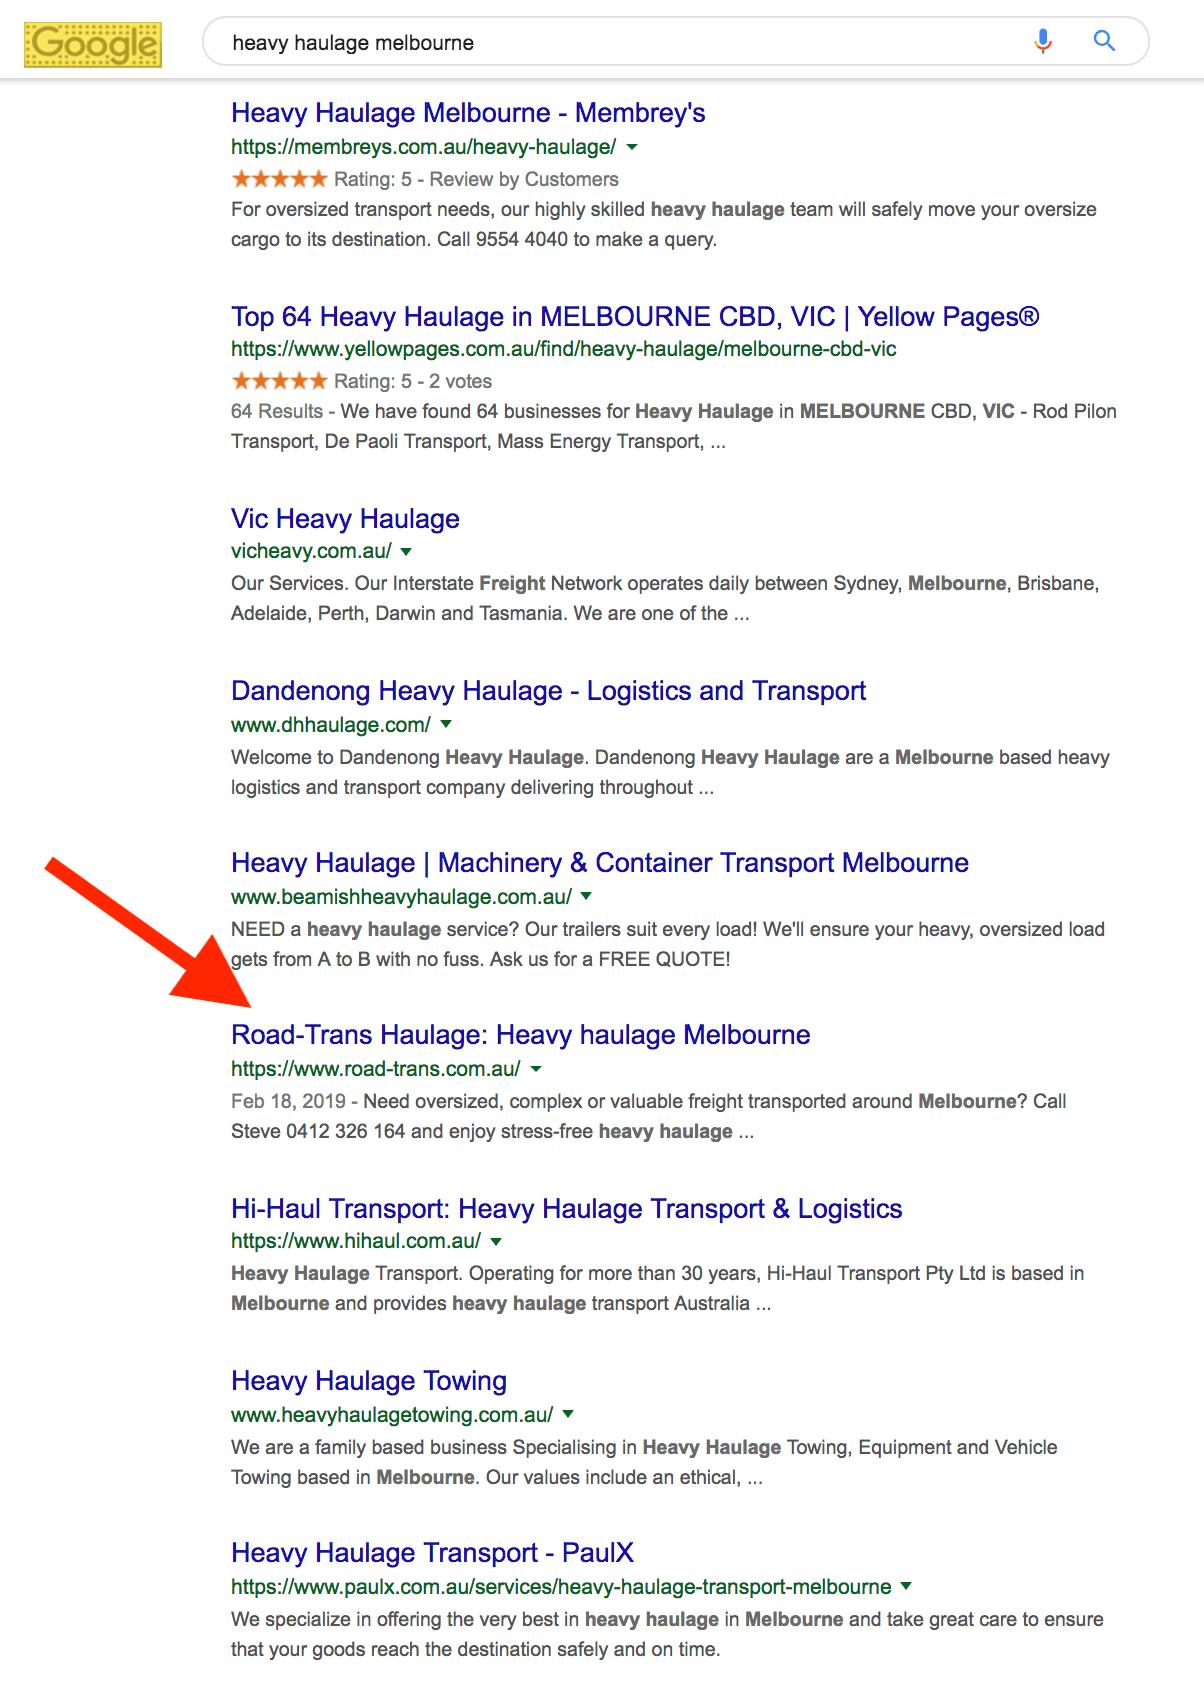 RoadTrans Haulage page 1 Google